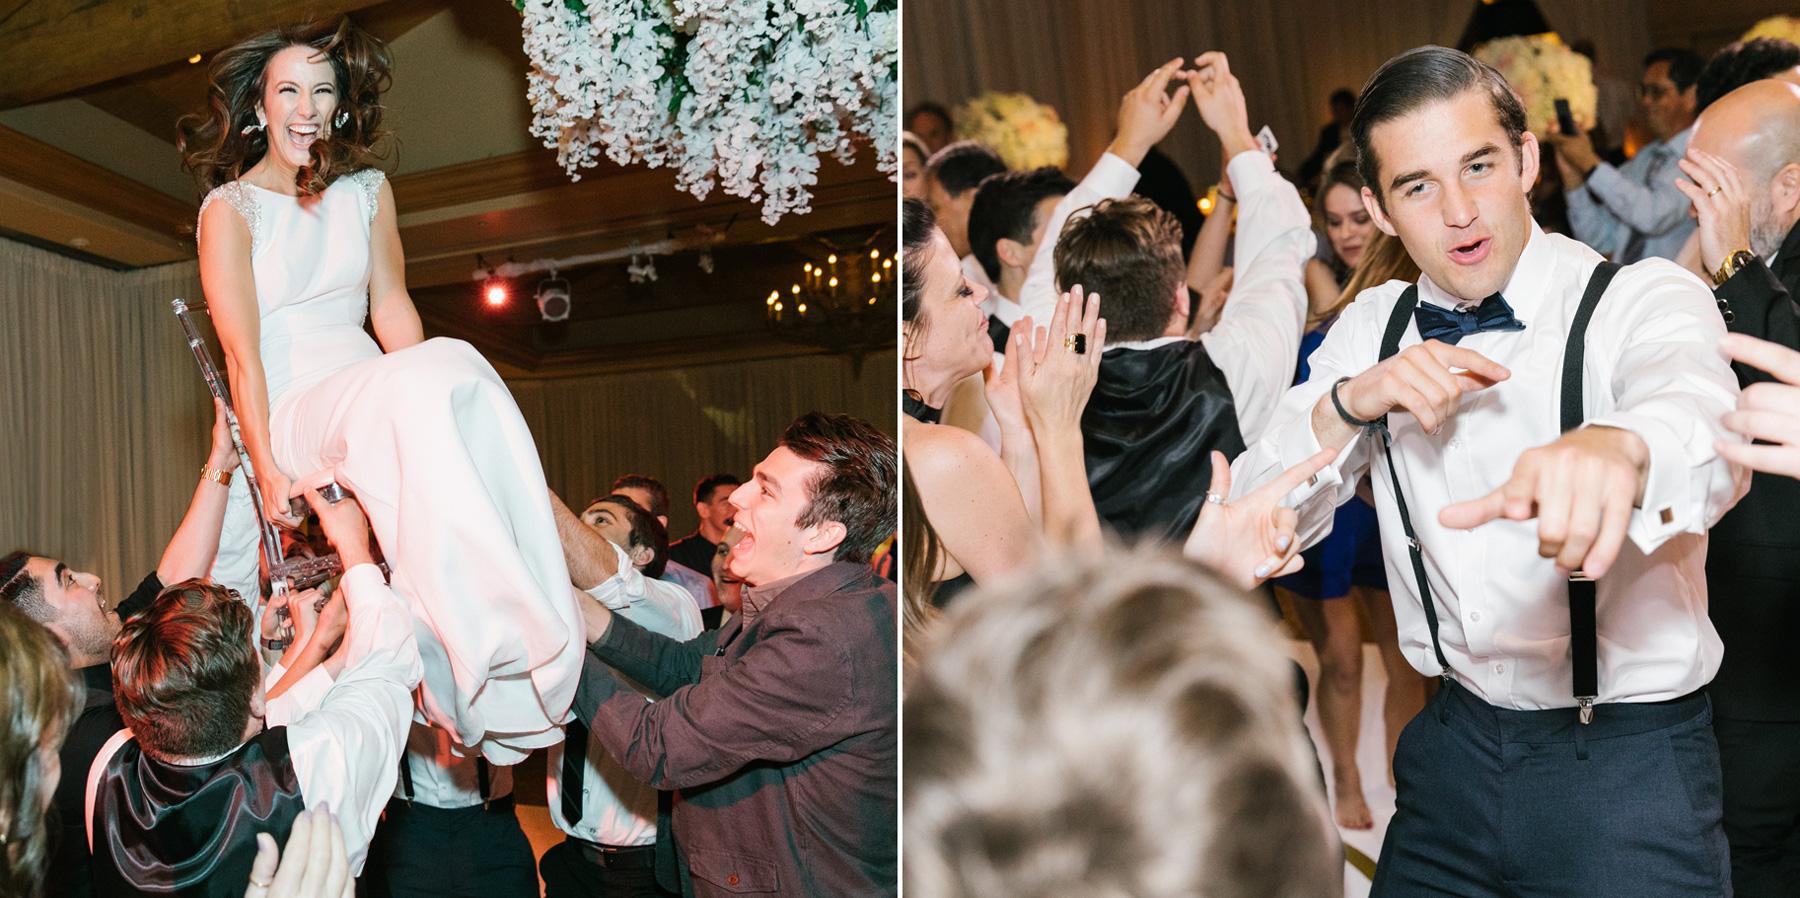 Pelican-hill-wedding-38.JPG